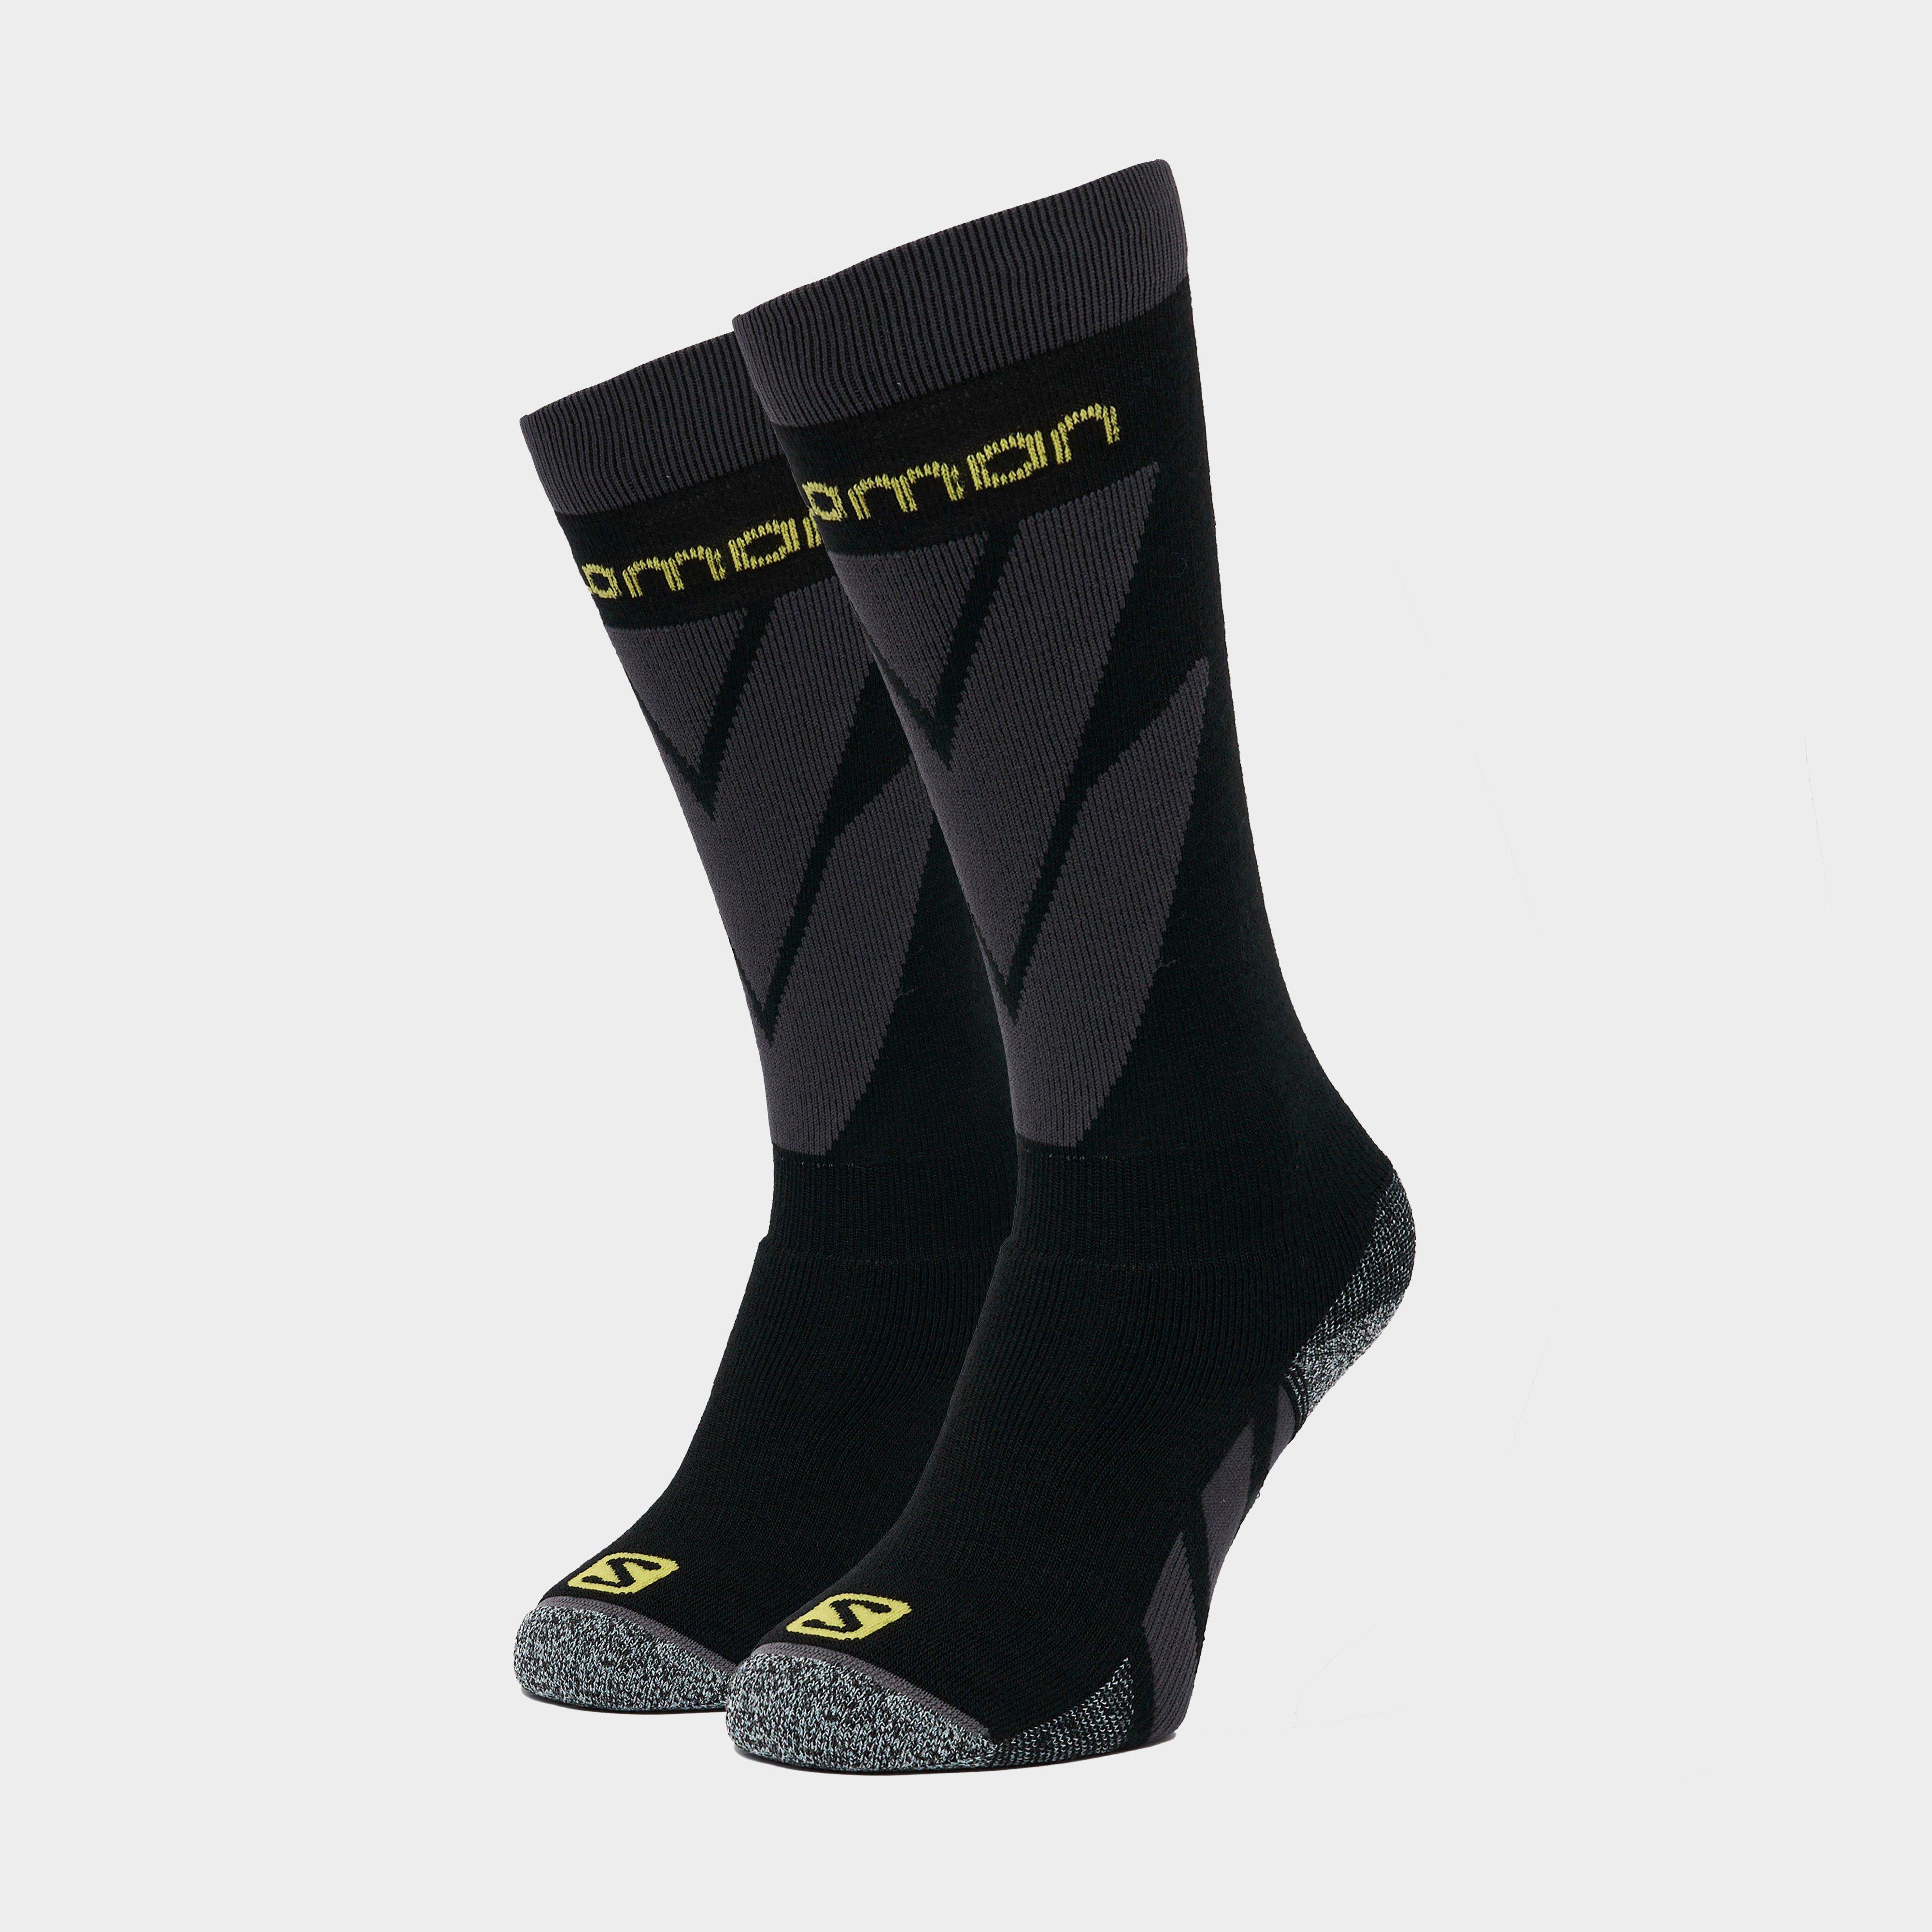 Salomon Socks Mens Access Skiing Socks (2 Pack) - Black/yellow  Black/yellow